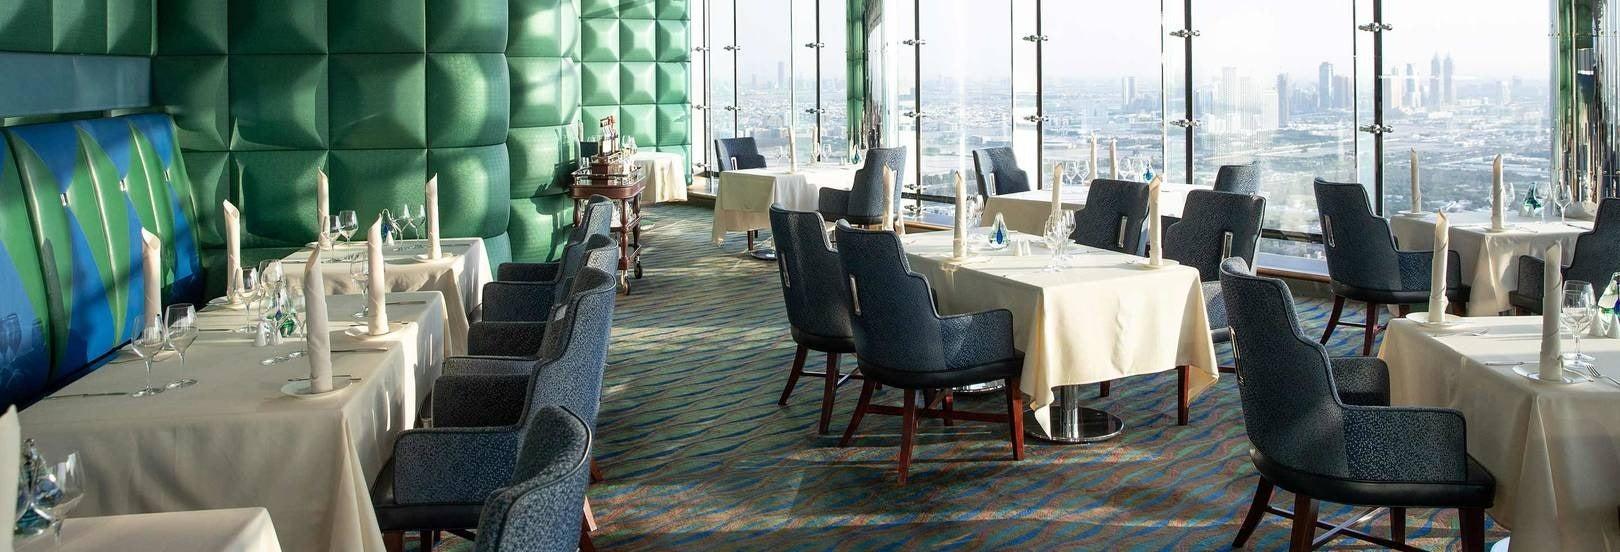 Déjeuner à l'hôtel 5 étoiles Burj Al Arab